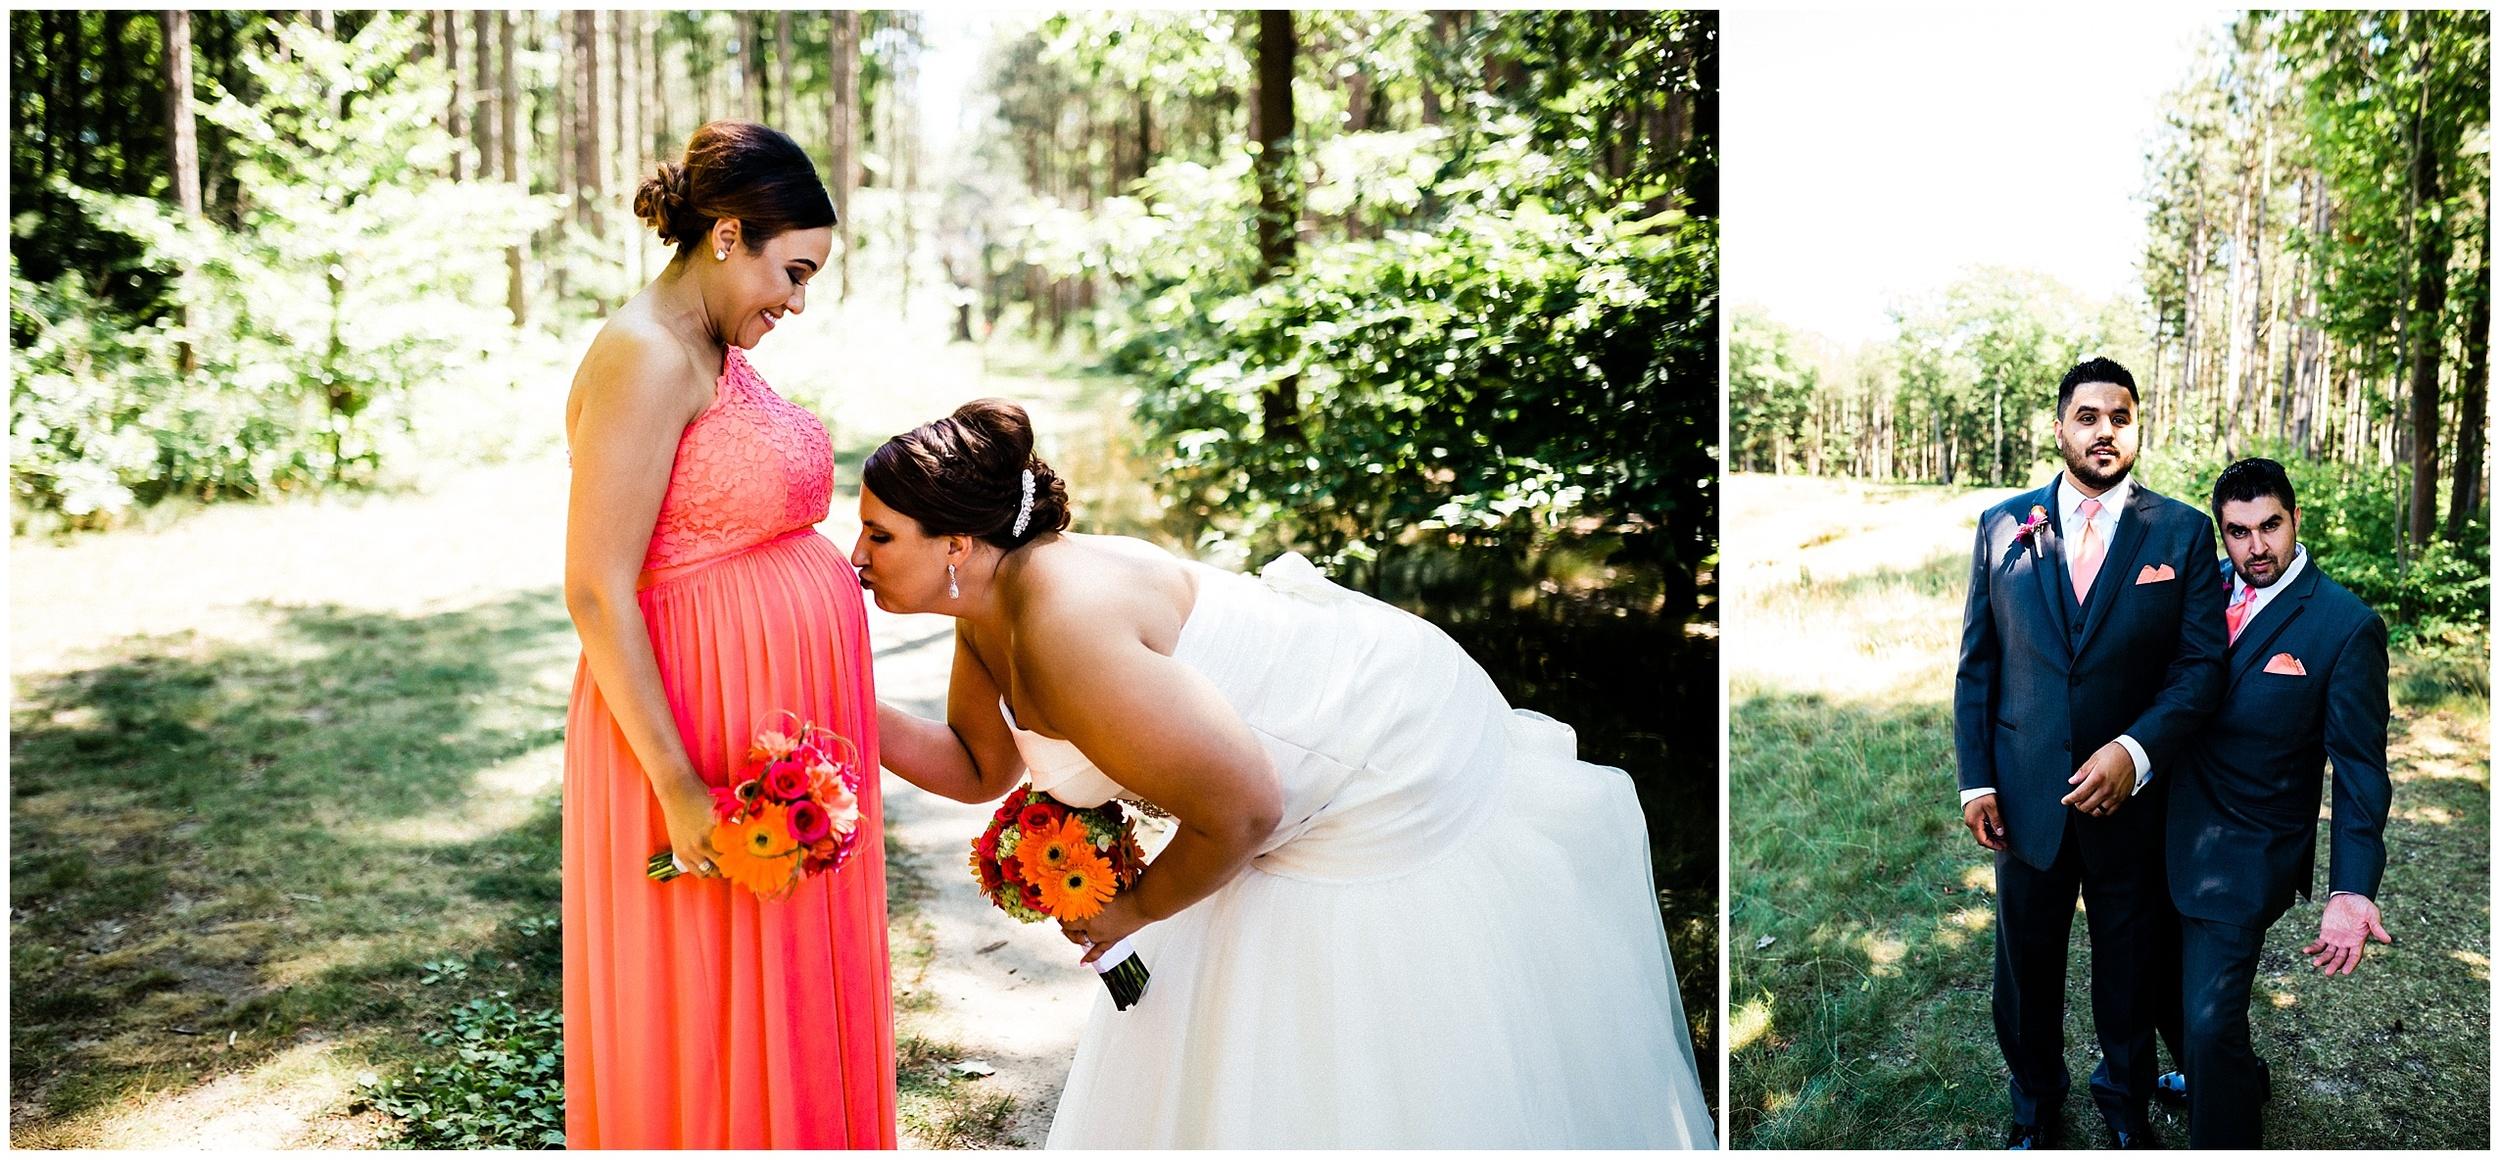 Josh + Ashley   Just Married #kyleepaigephotography_0446.jpg